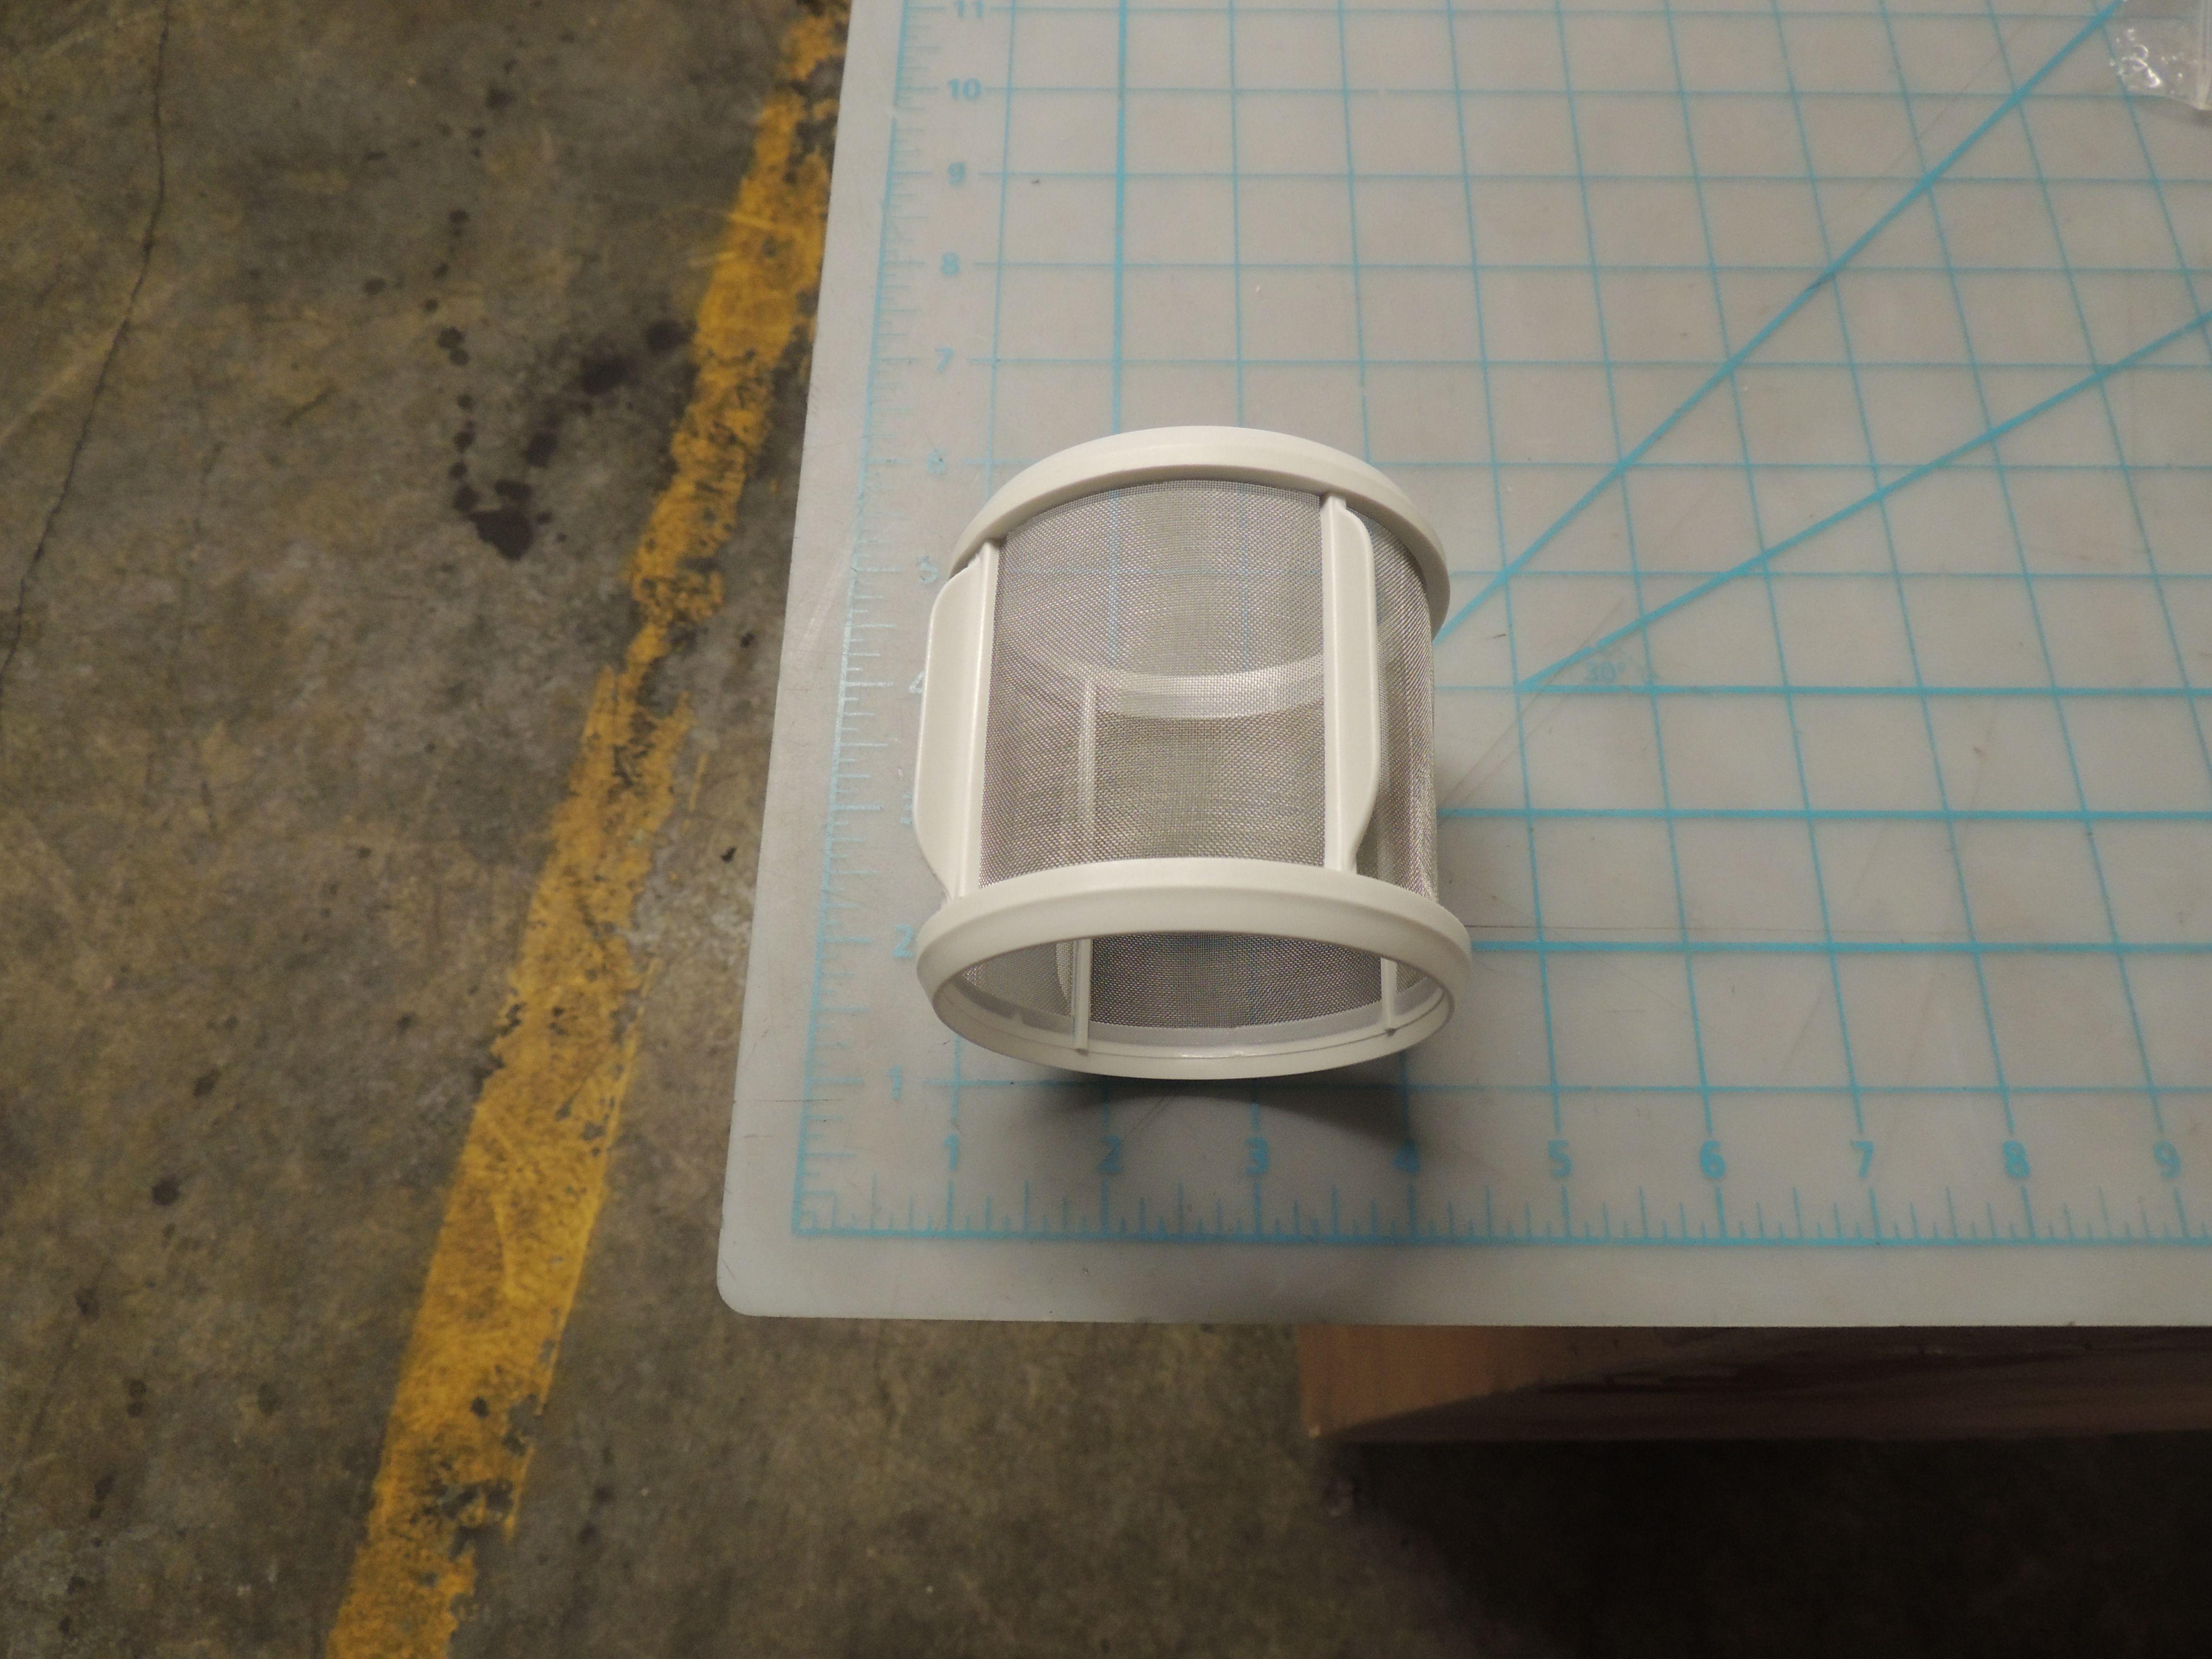 micro filter